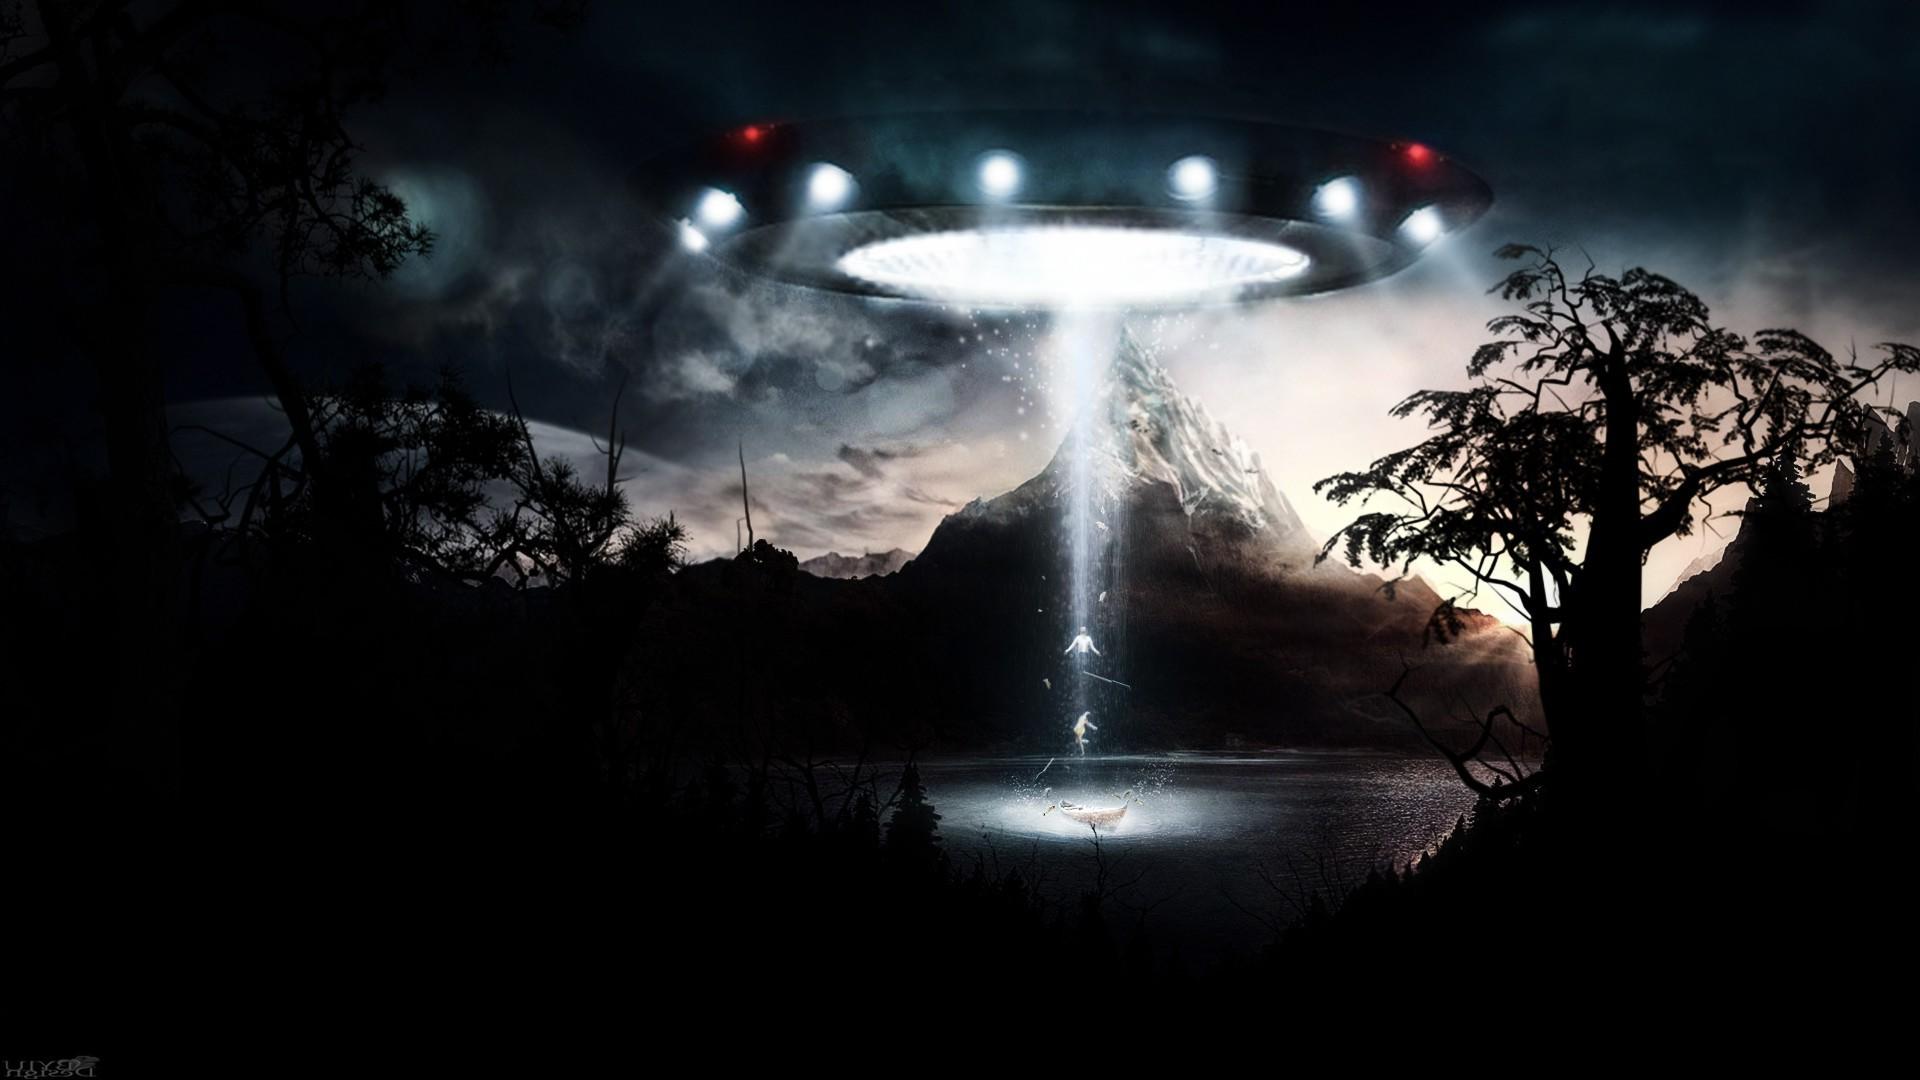 Ufo wallpaper hd 72 images - Alien desktop ...